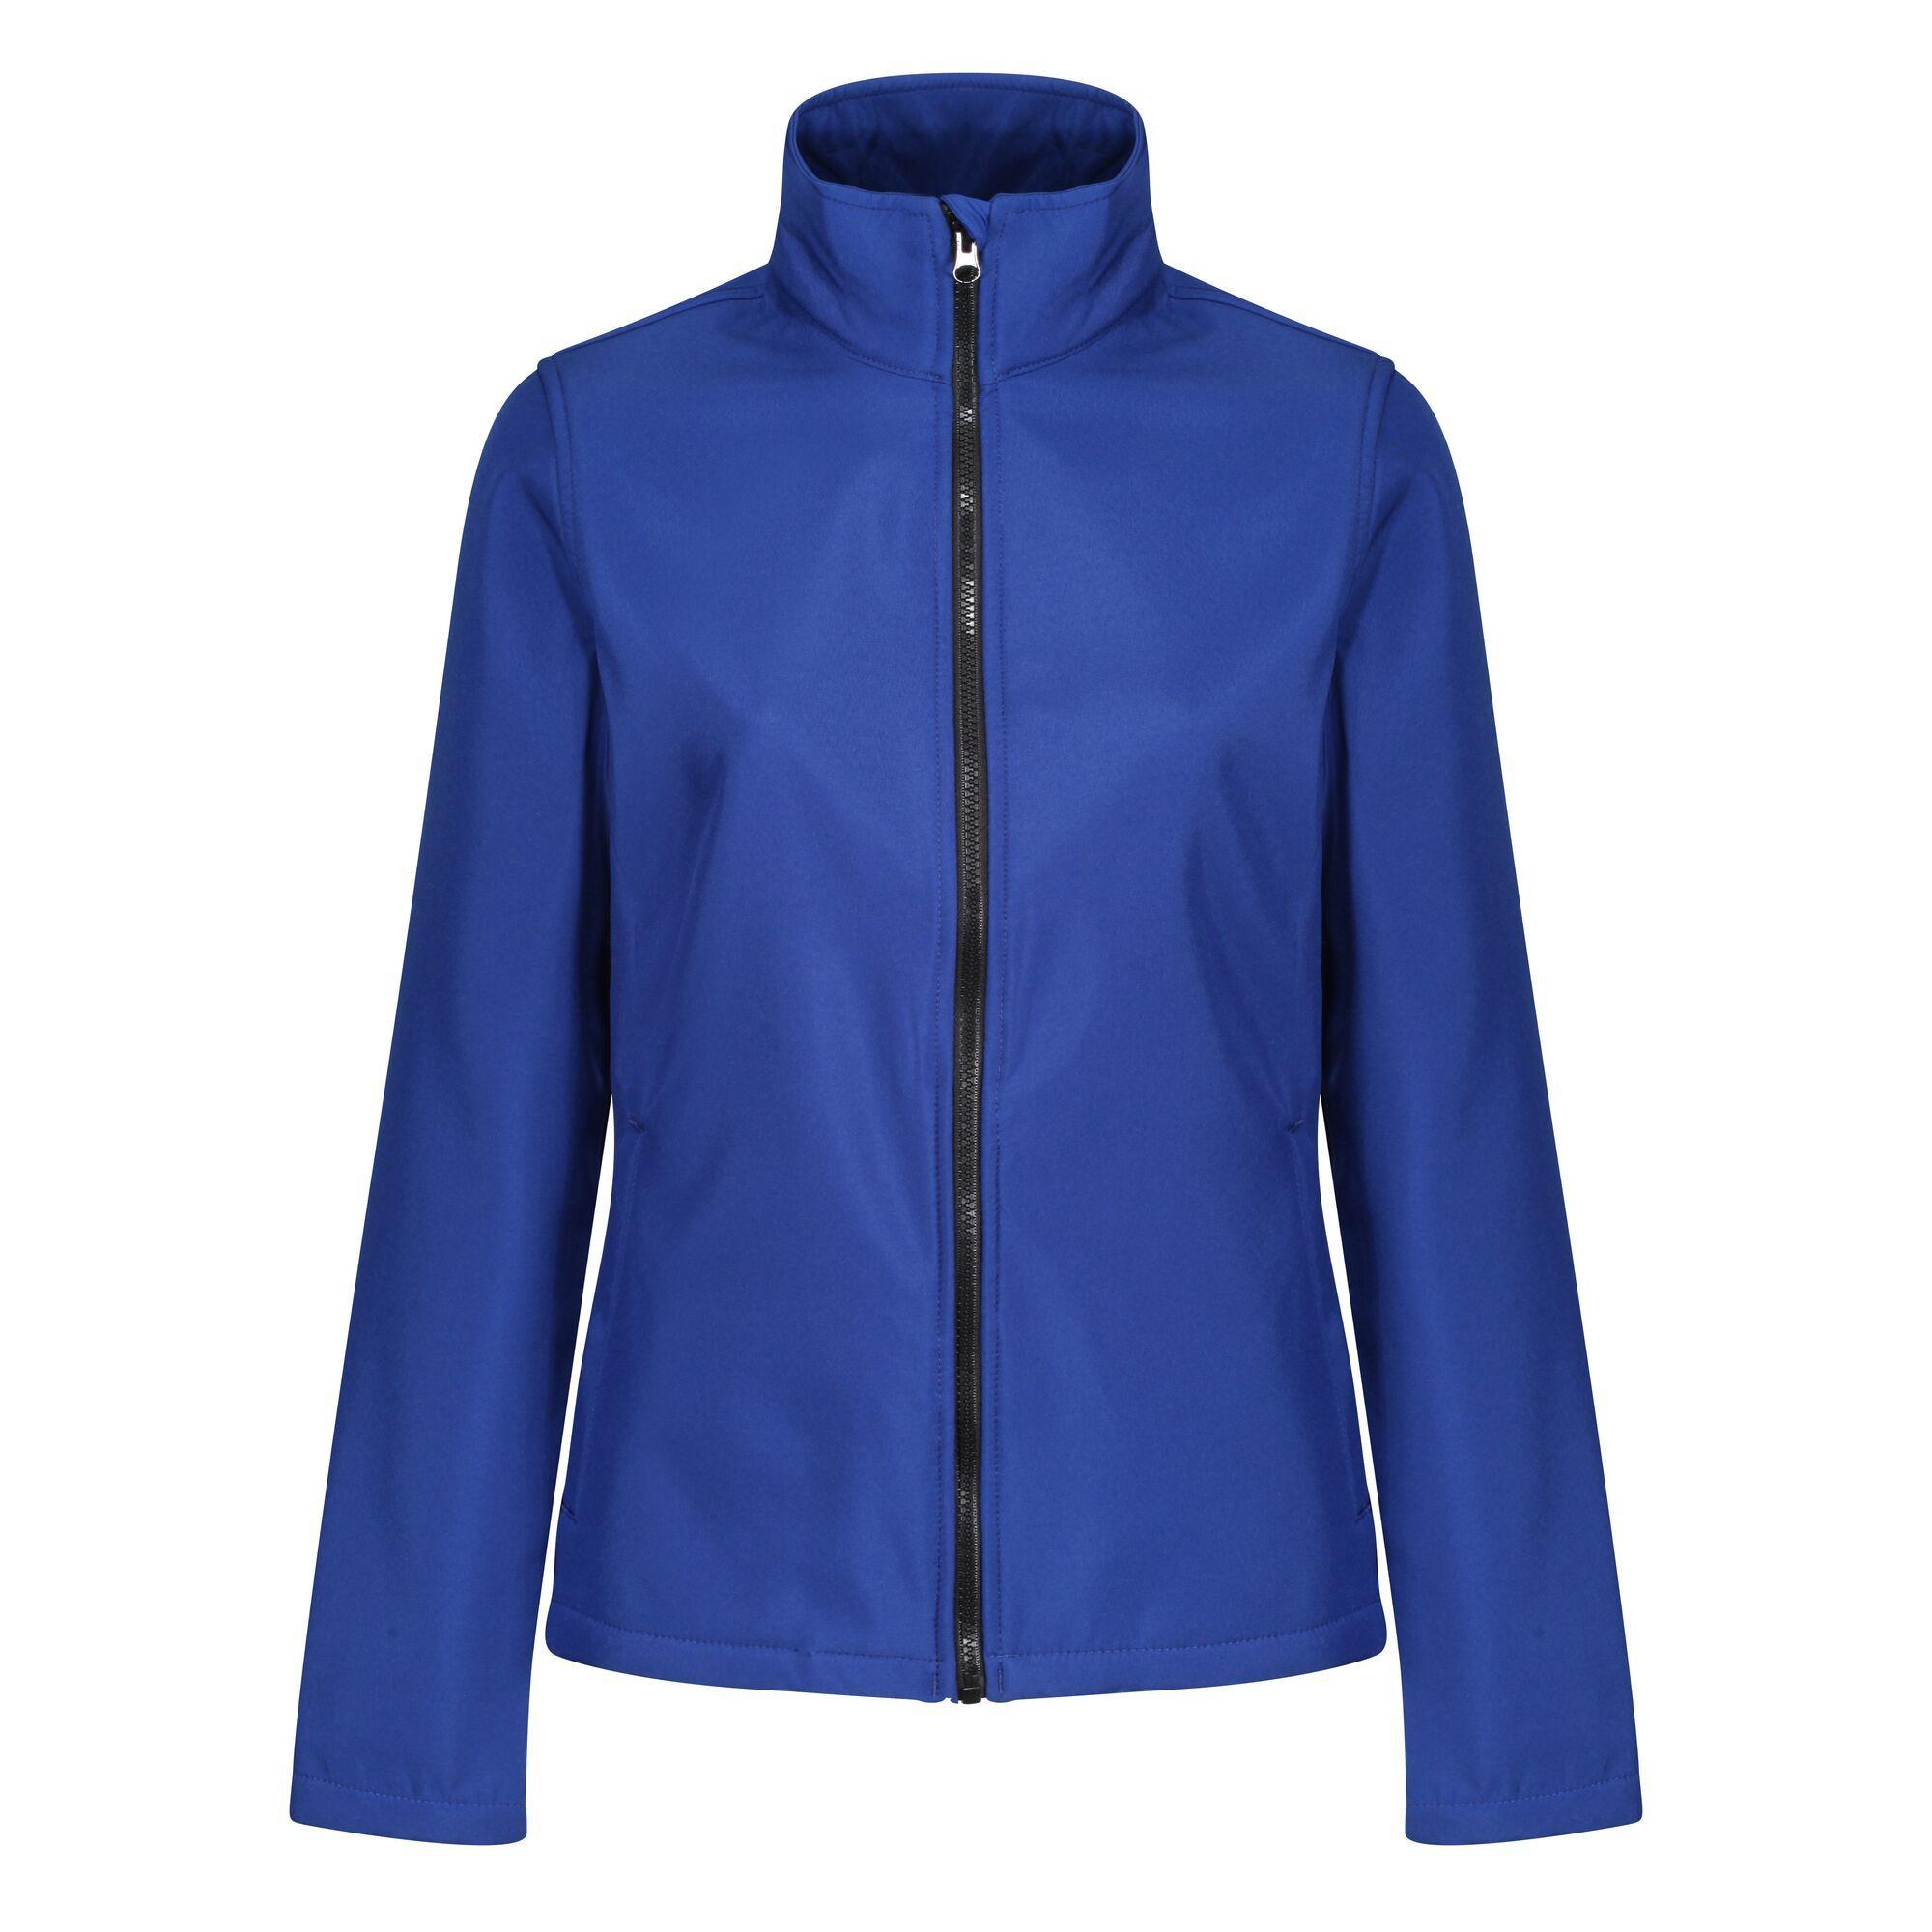 Regatta Standout Womens/Ladies Ablaze Printable Soft Shell Jacket (10) (Navy/Navy)